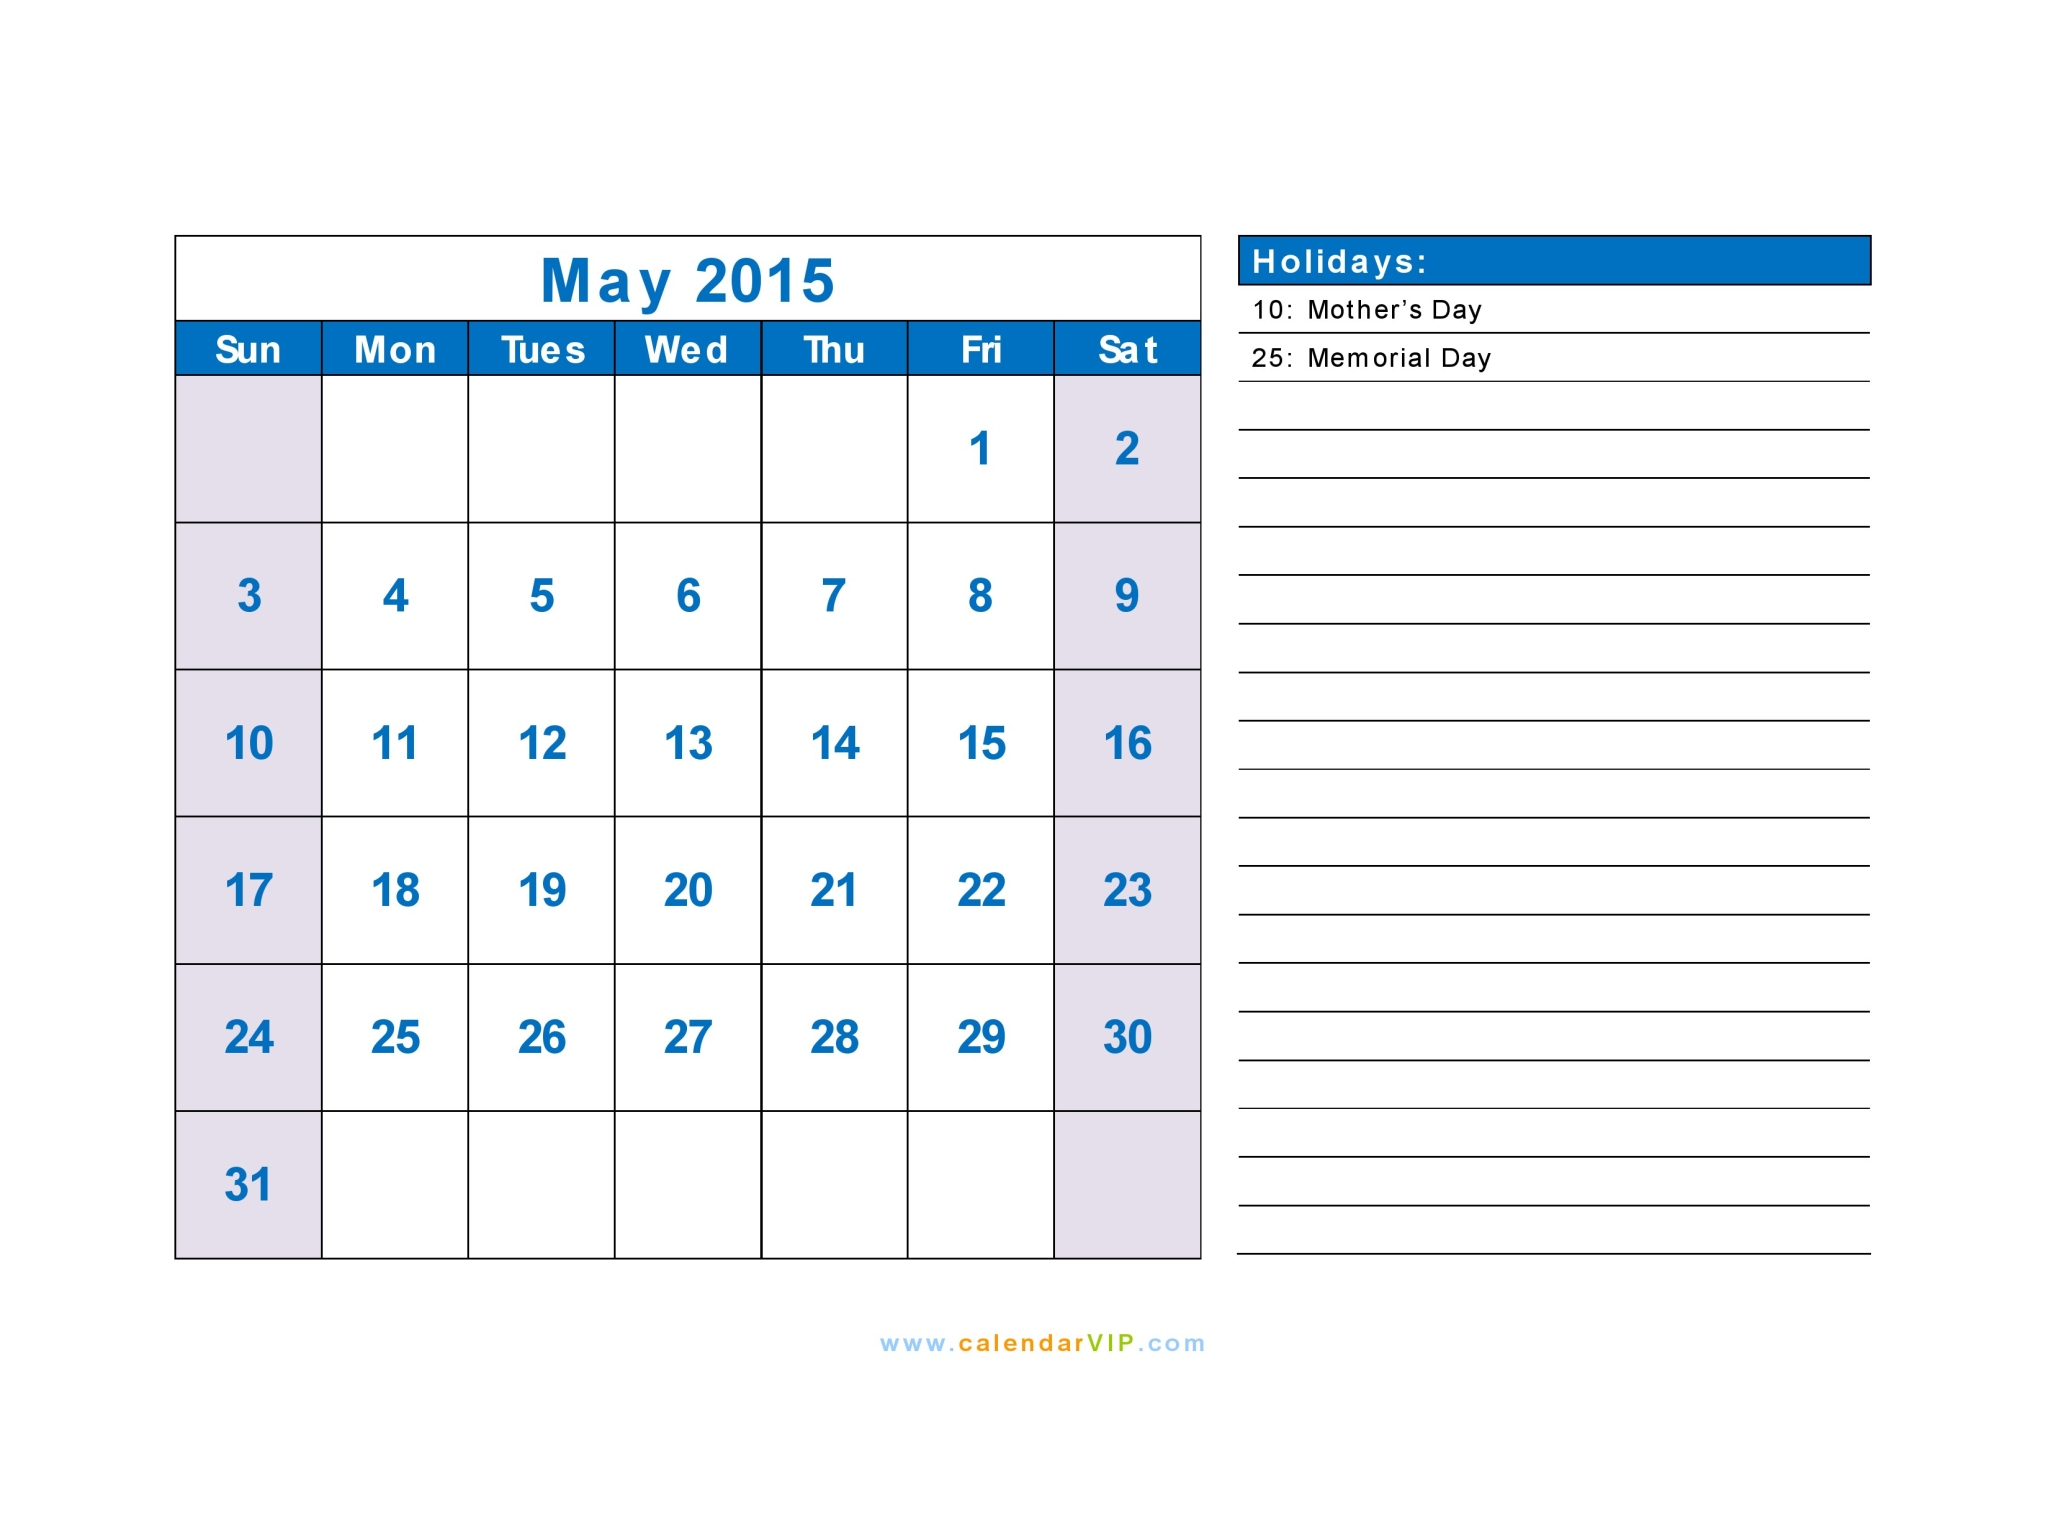 May 2015 Calendar Blank Printable Calendar Template In